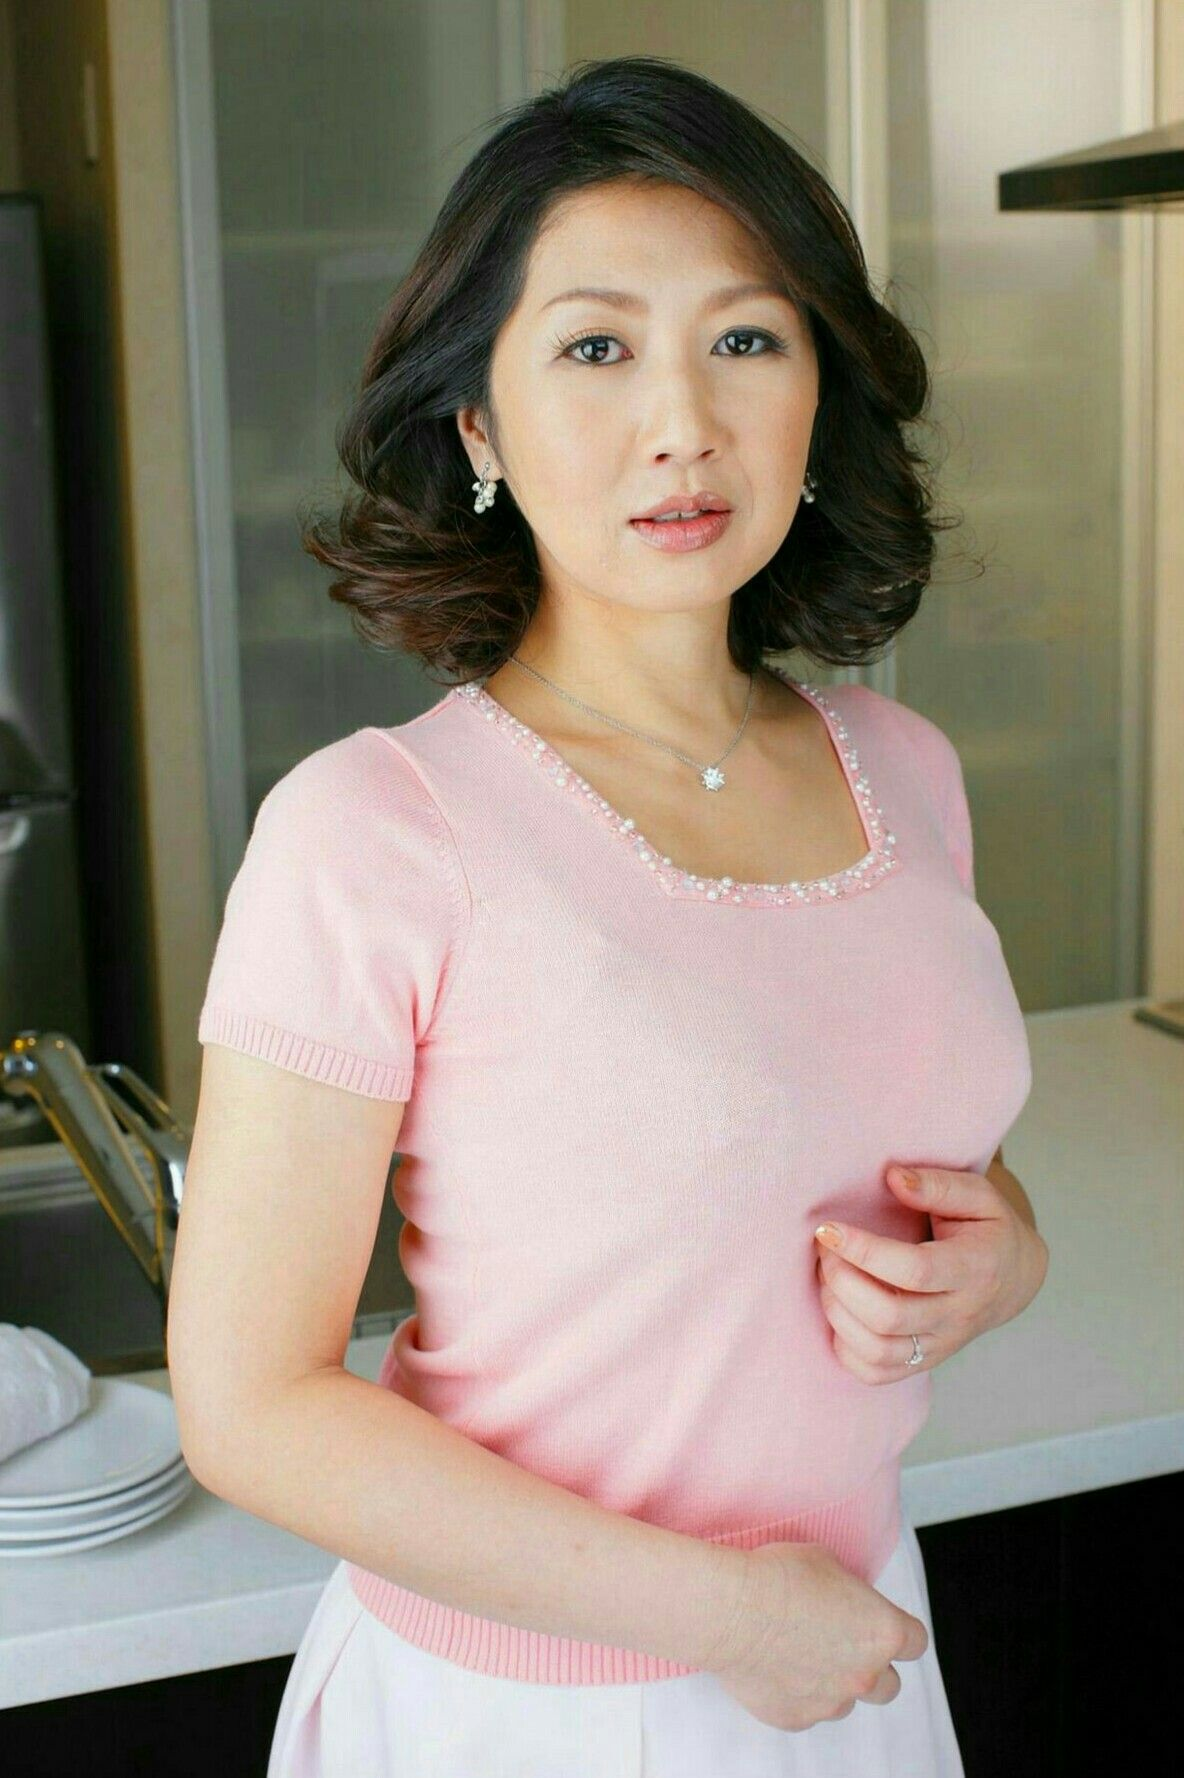 Shenzhen mature woman